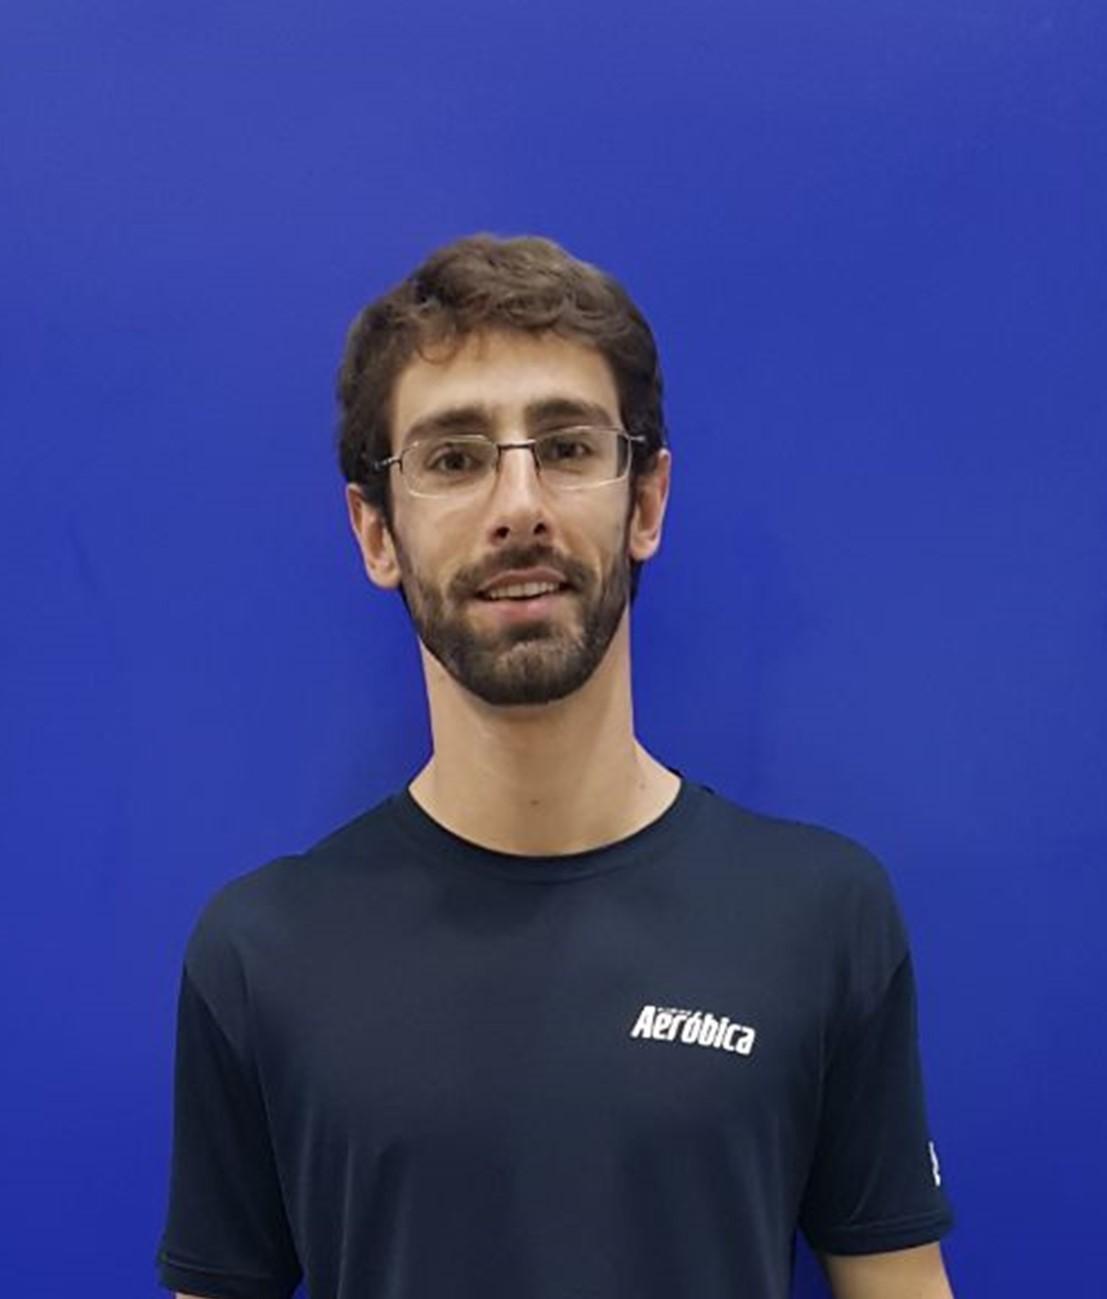 Fernando Affonseca